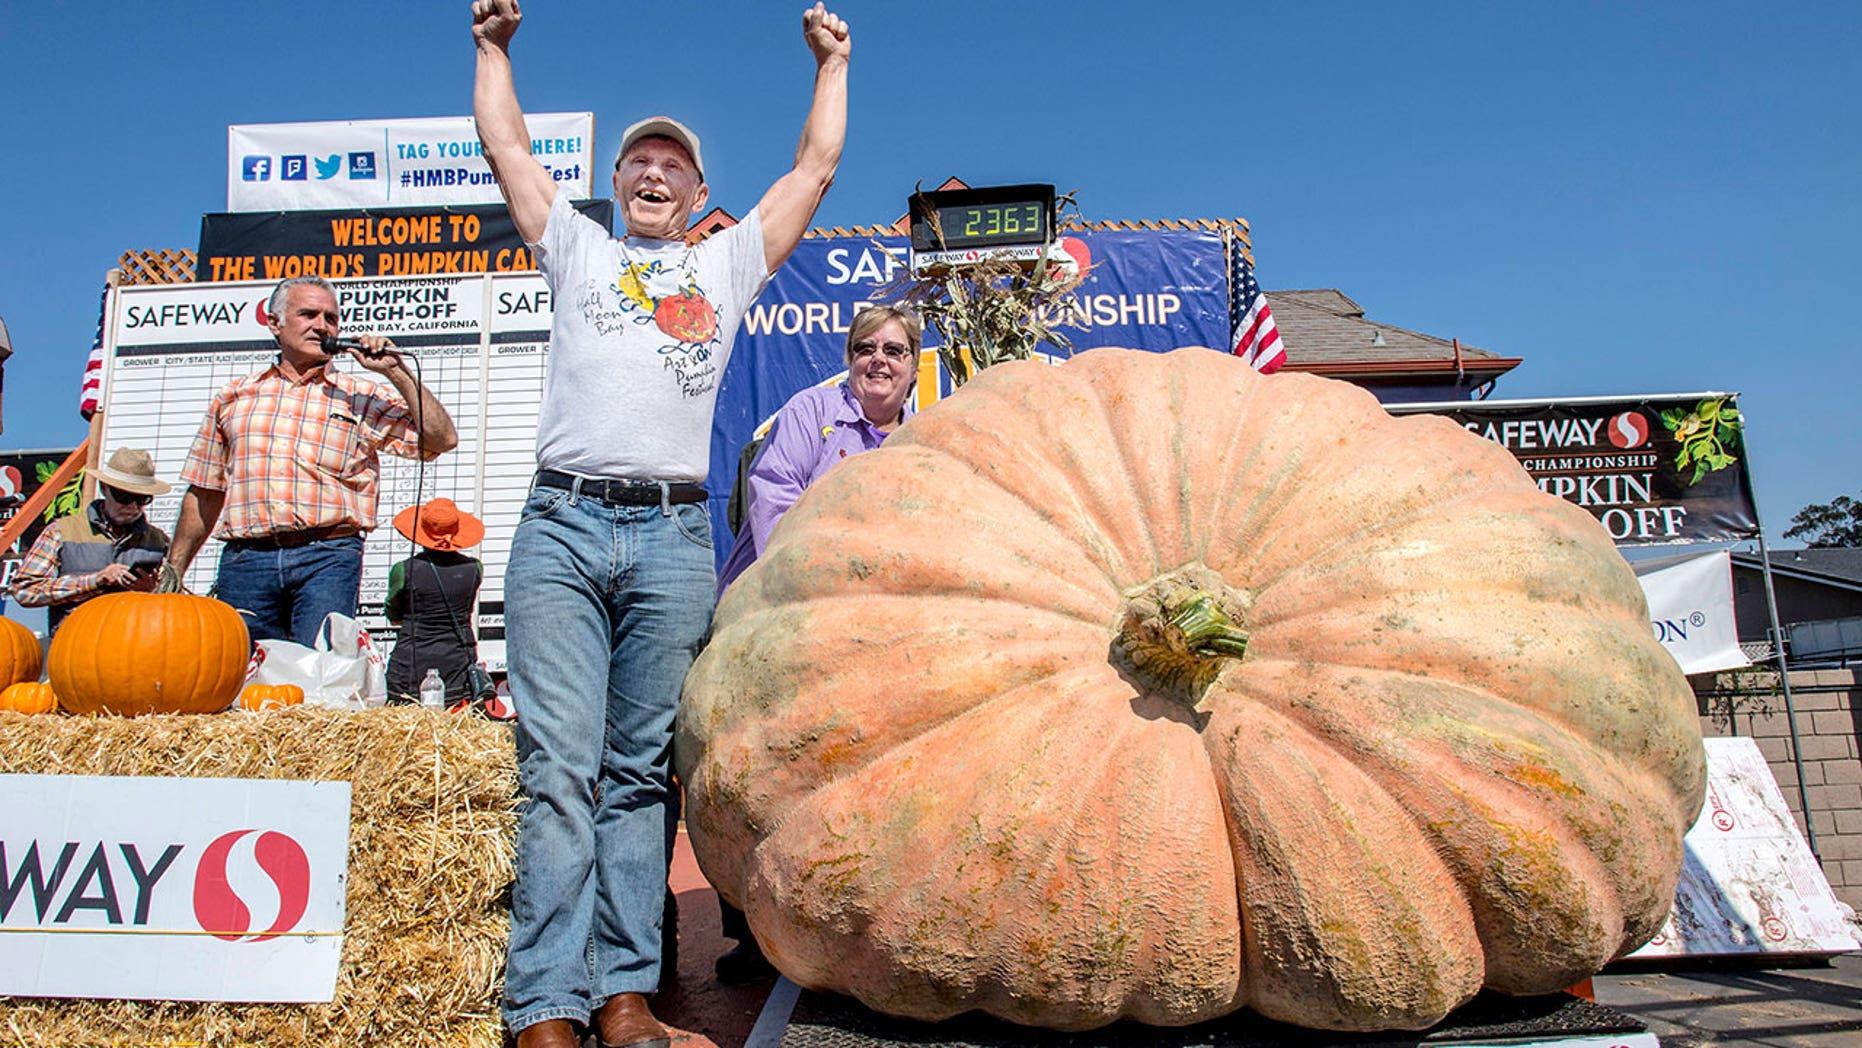 Joel Holland won the 44th World Championship Pumpkin Weigh-Off in Half Moon Bay, Calif., on Monday, Oct. 9, 2017.